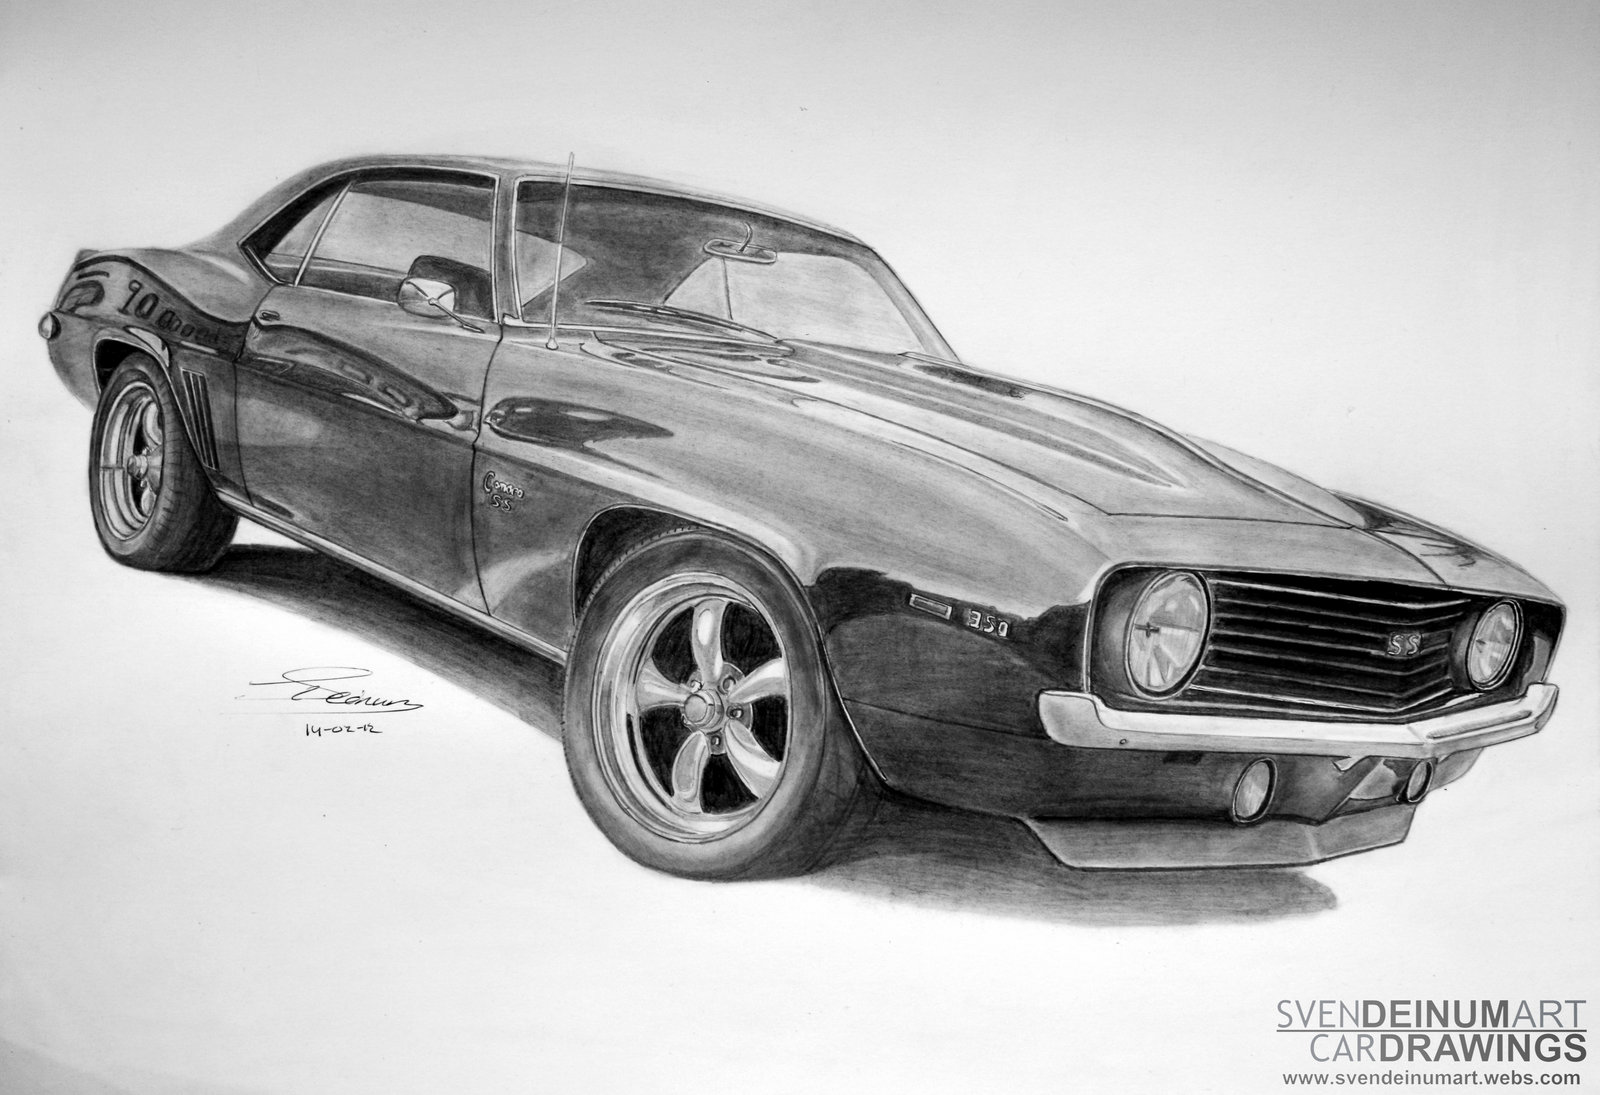 Drawn vehicle camaro ss On  by art art